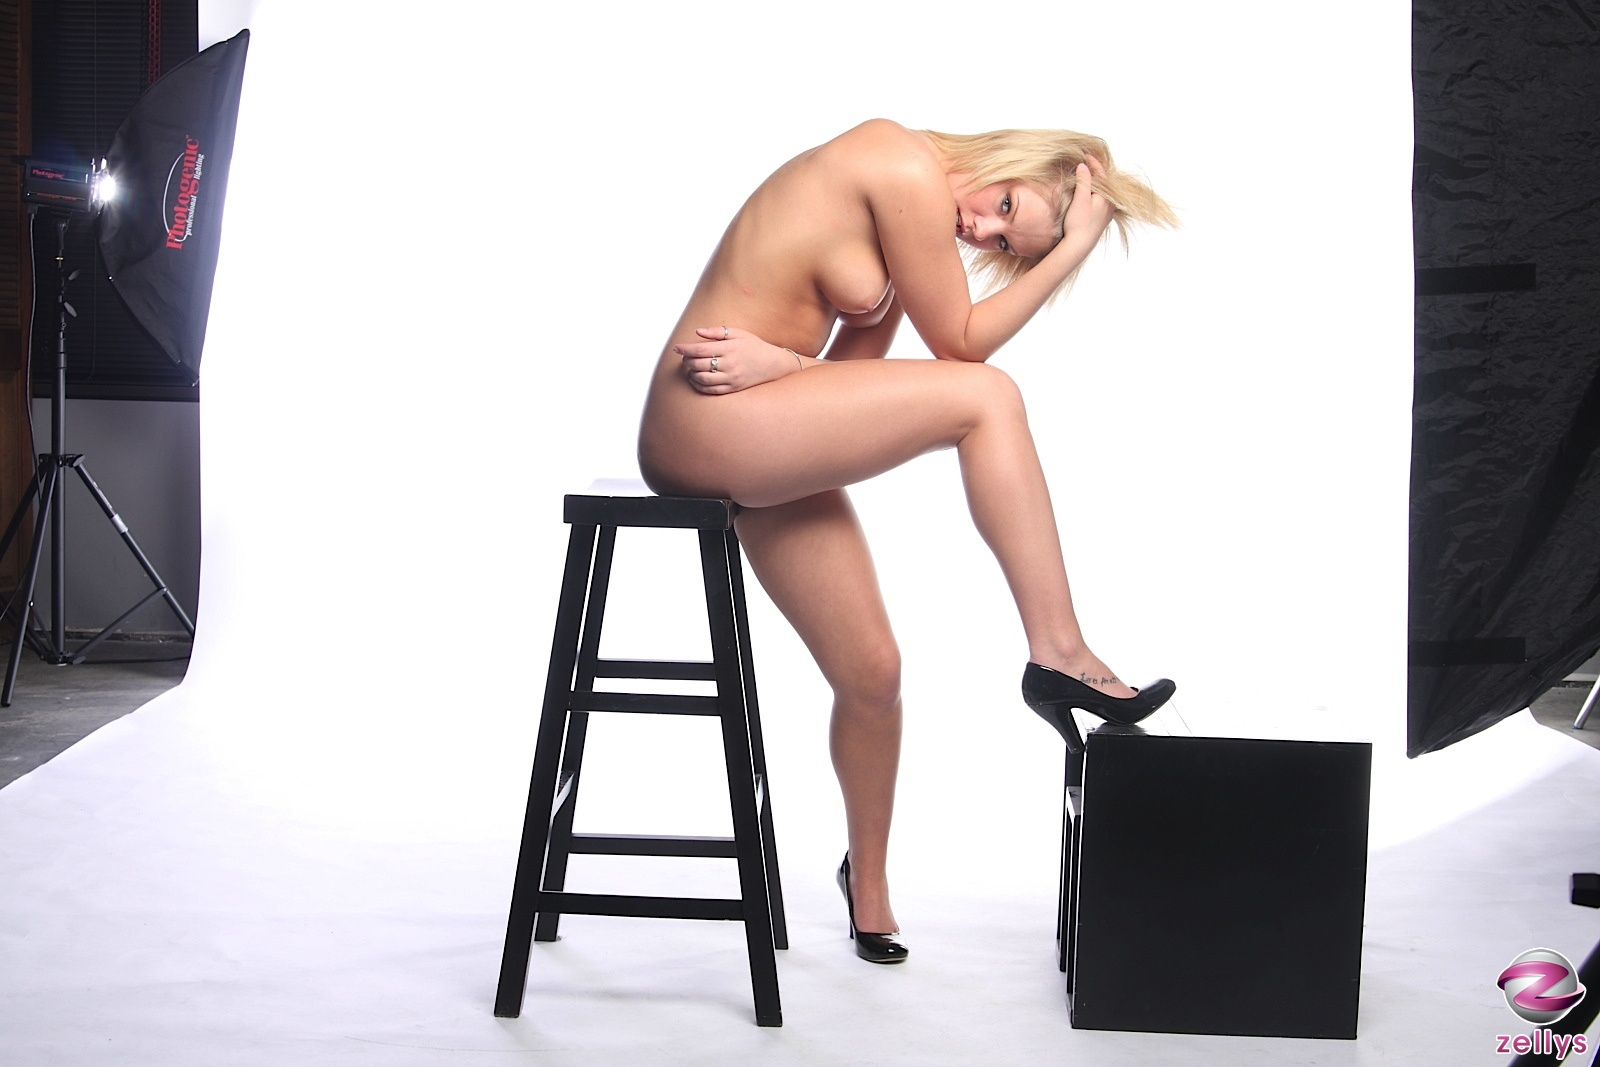 Taylor ingle posing nude